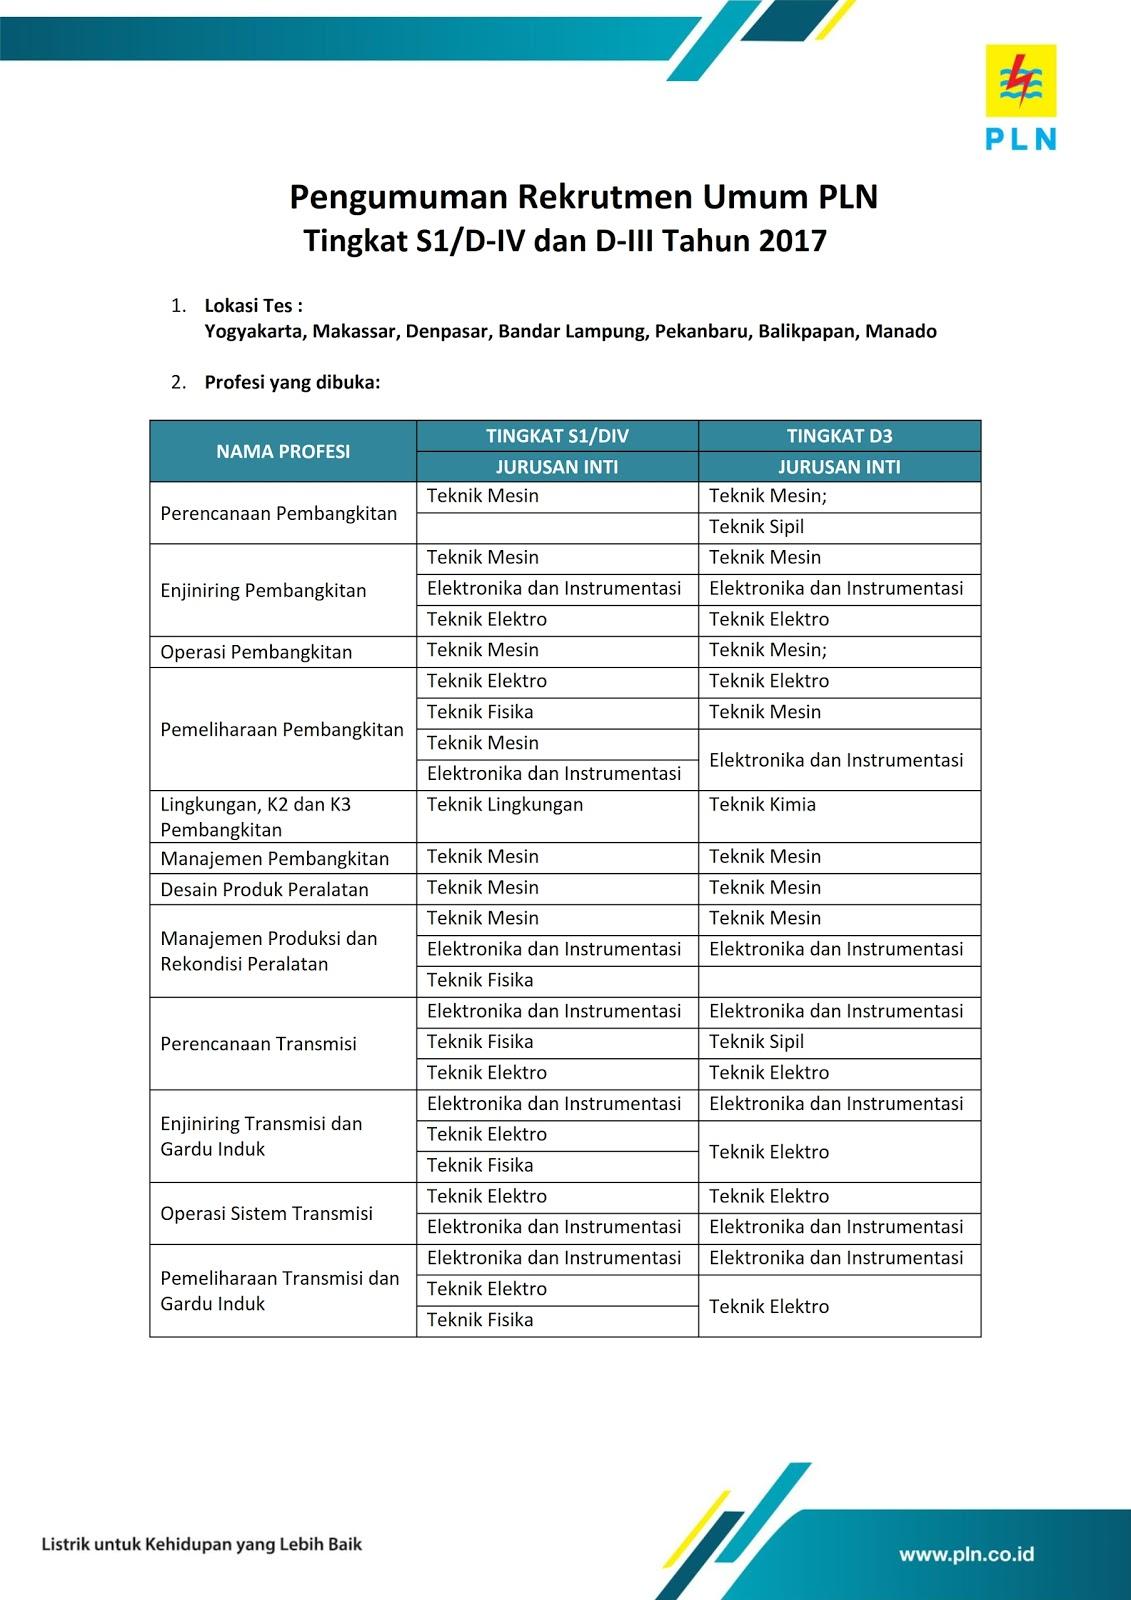 Rekrutmen Umum PLN Tingkat S1/DIV/DIII Tahun 2017